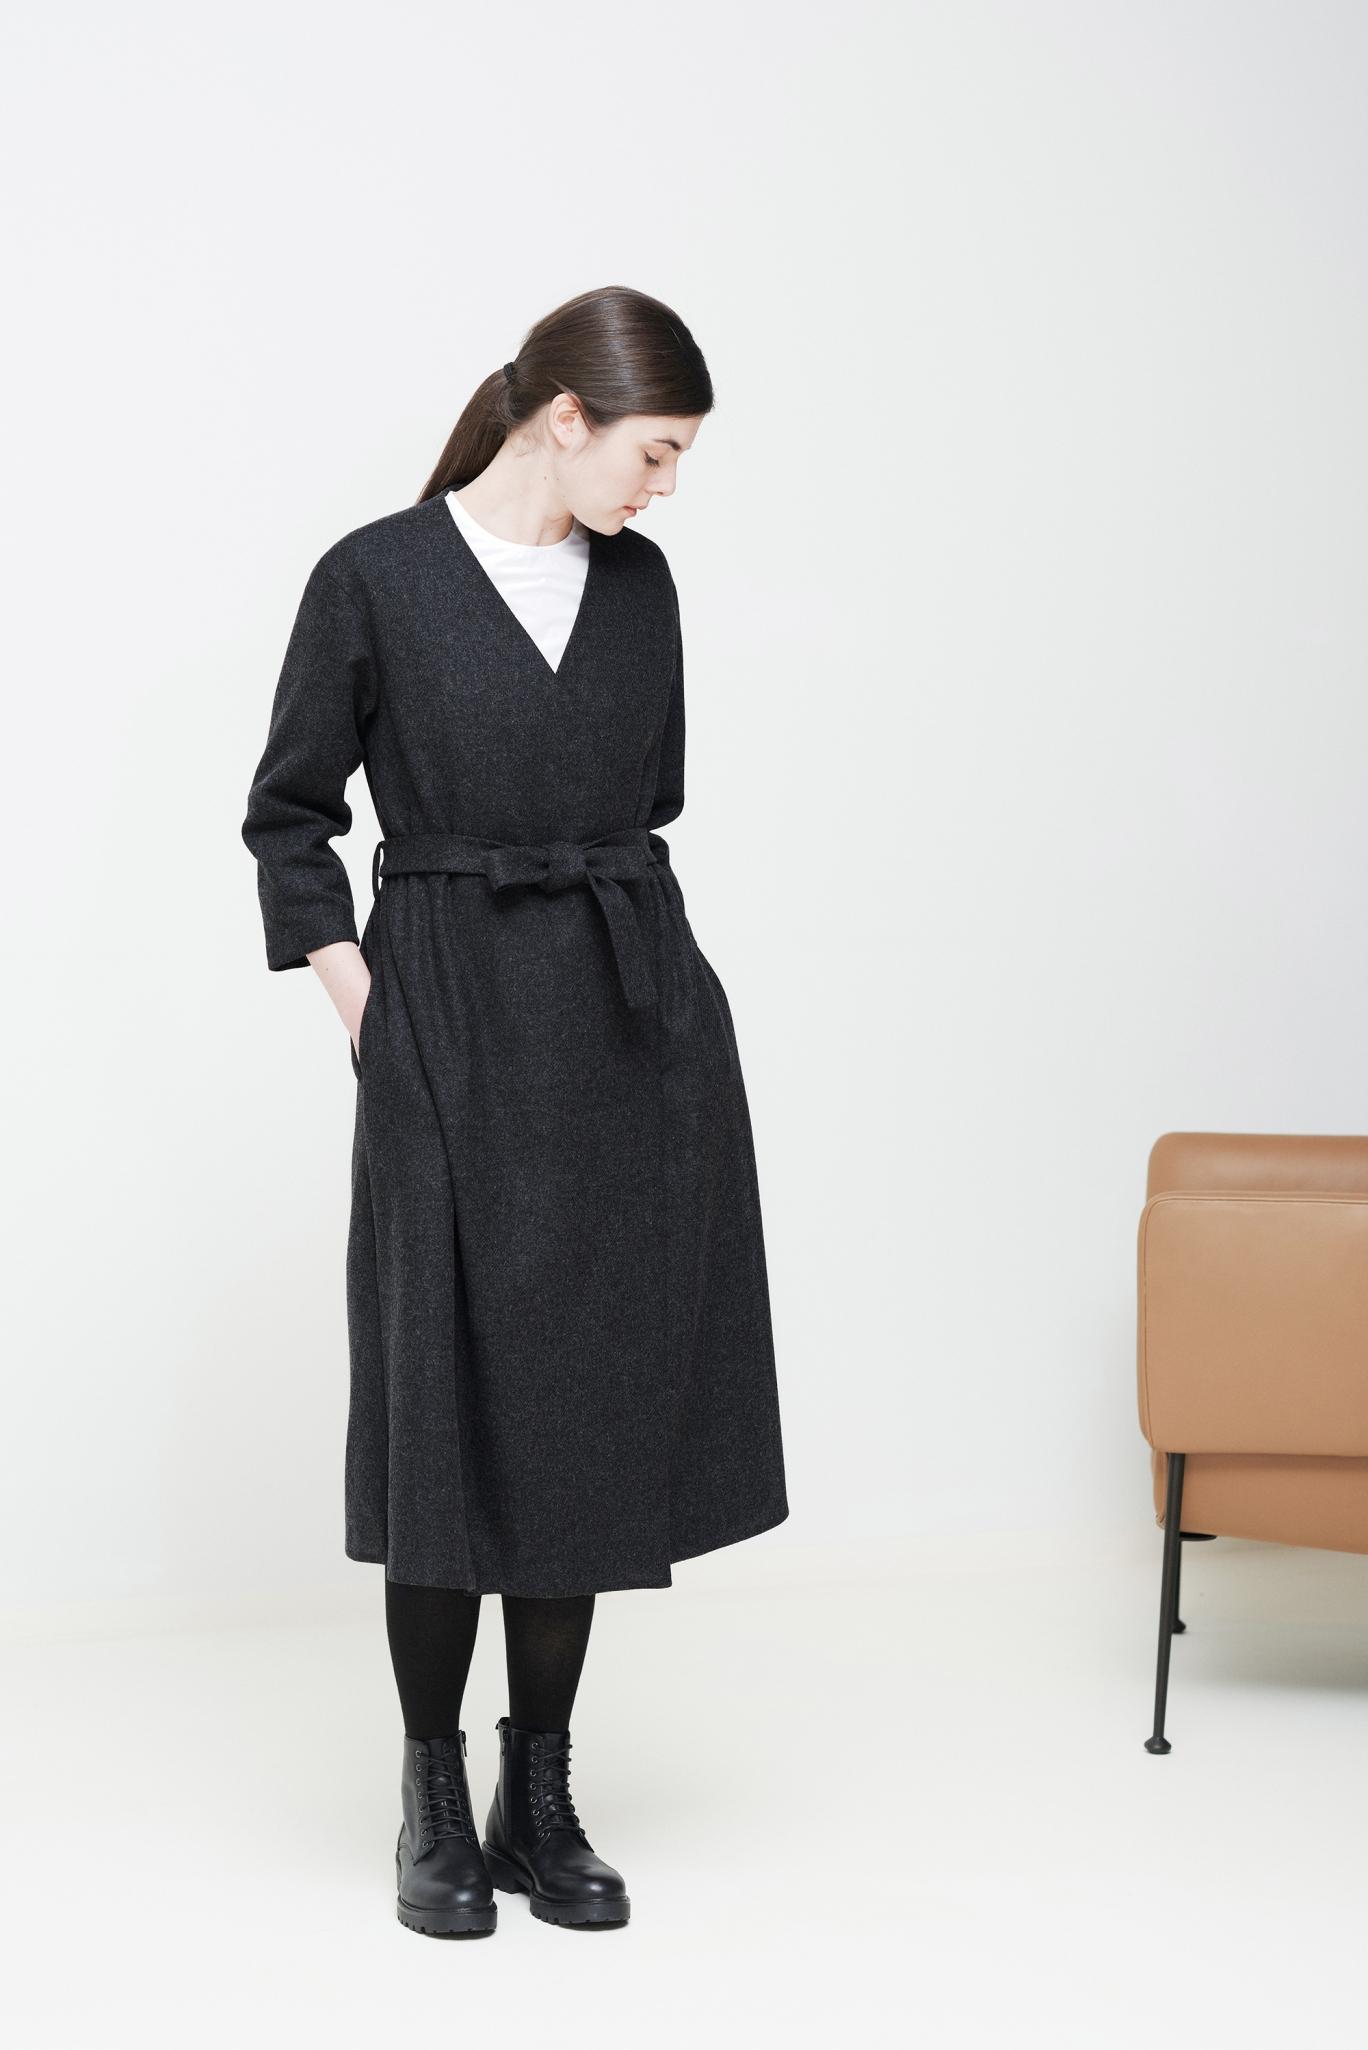 Garderob050338 copy scaled